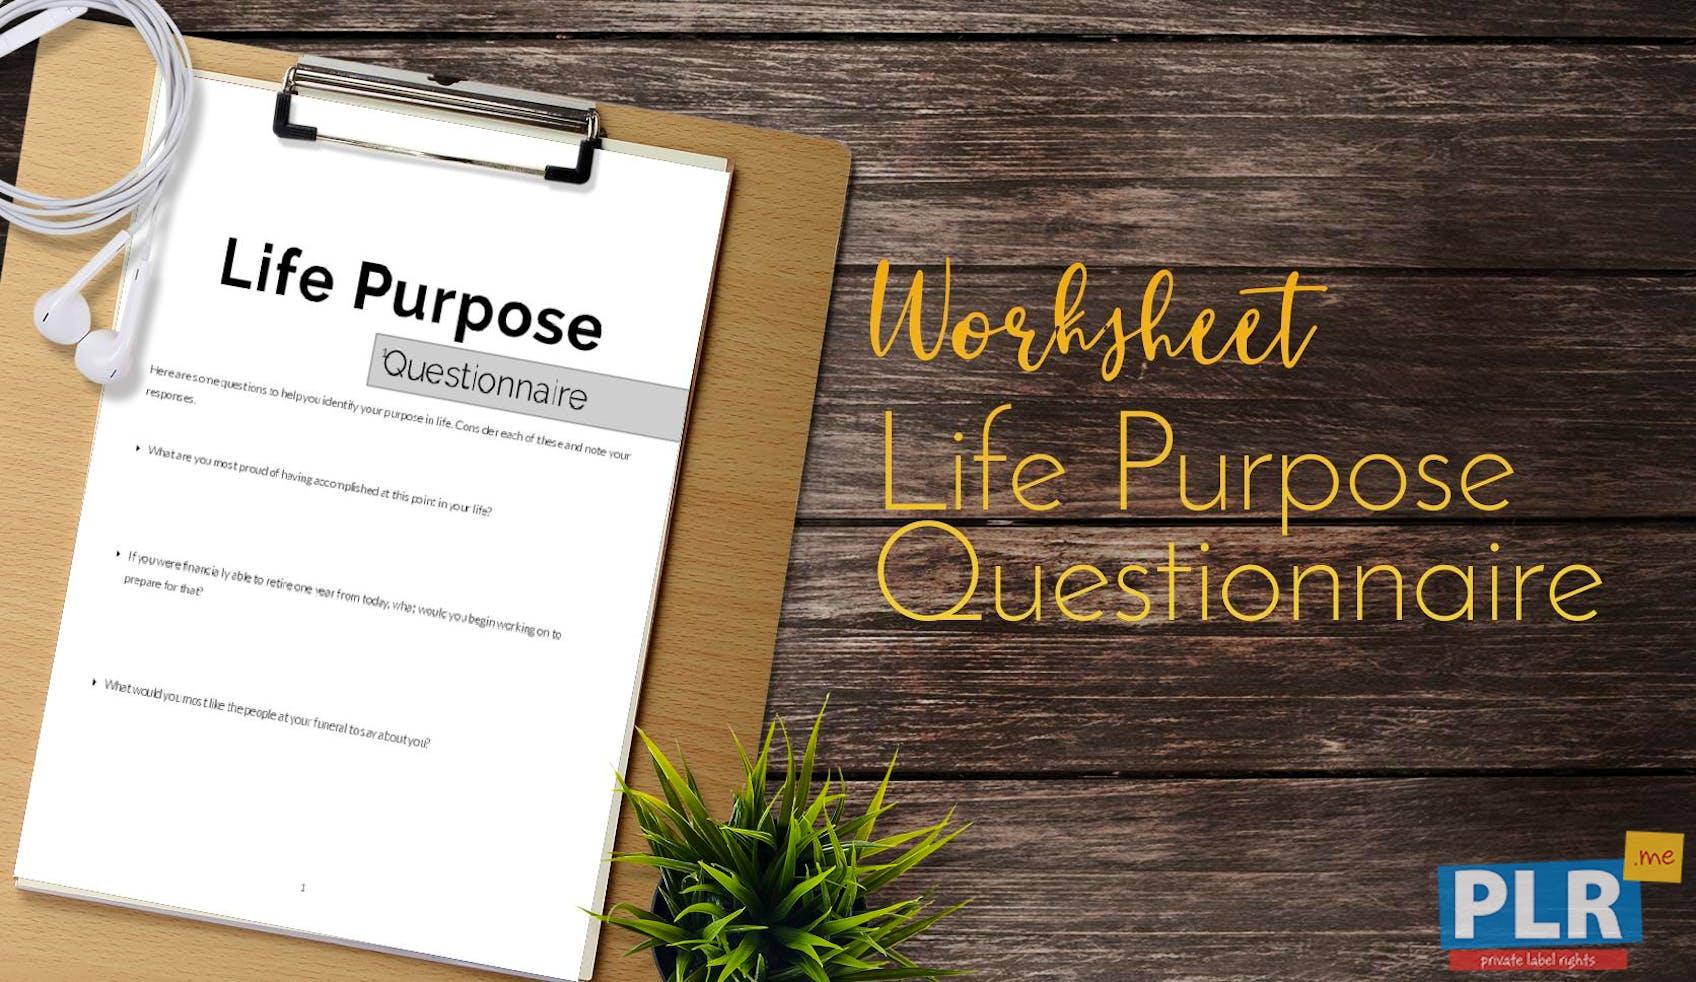 Life Purpose Questionnaire